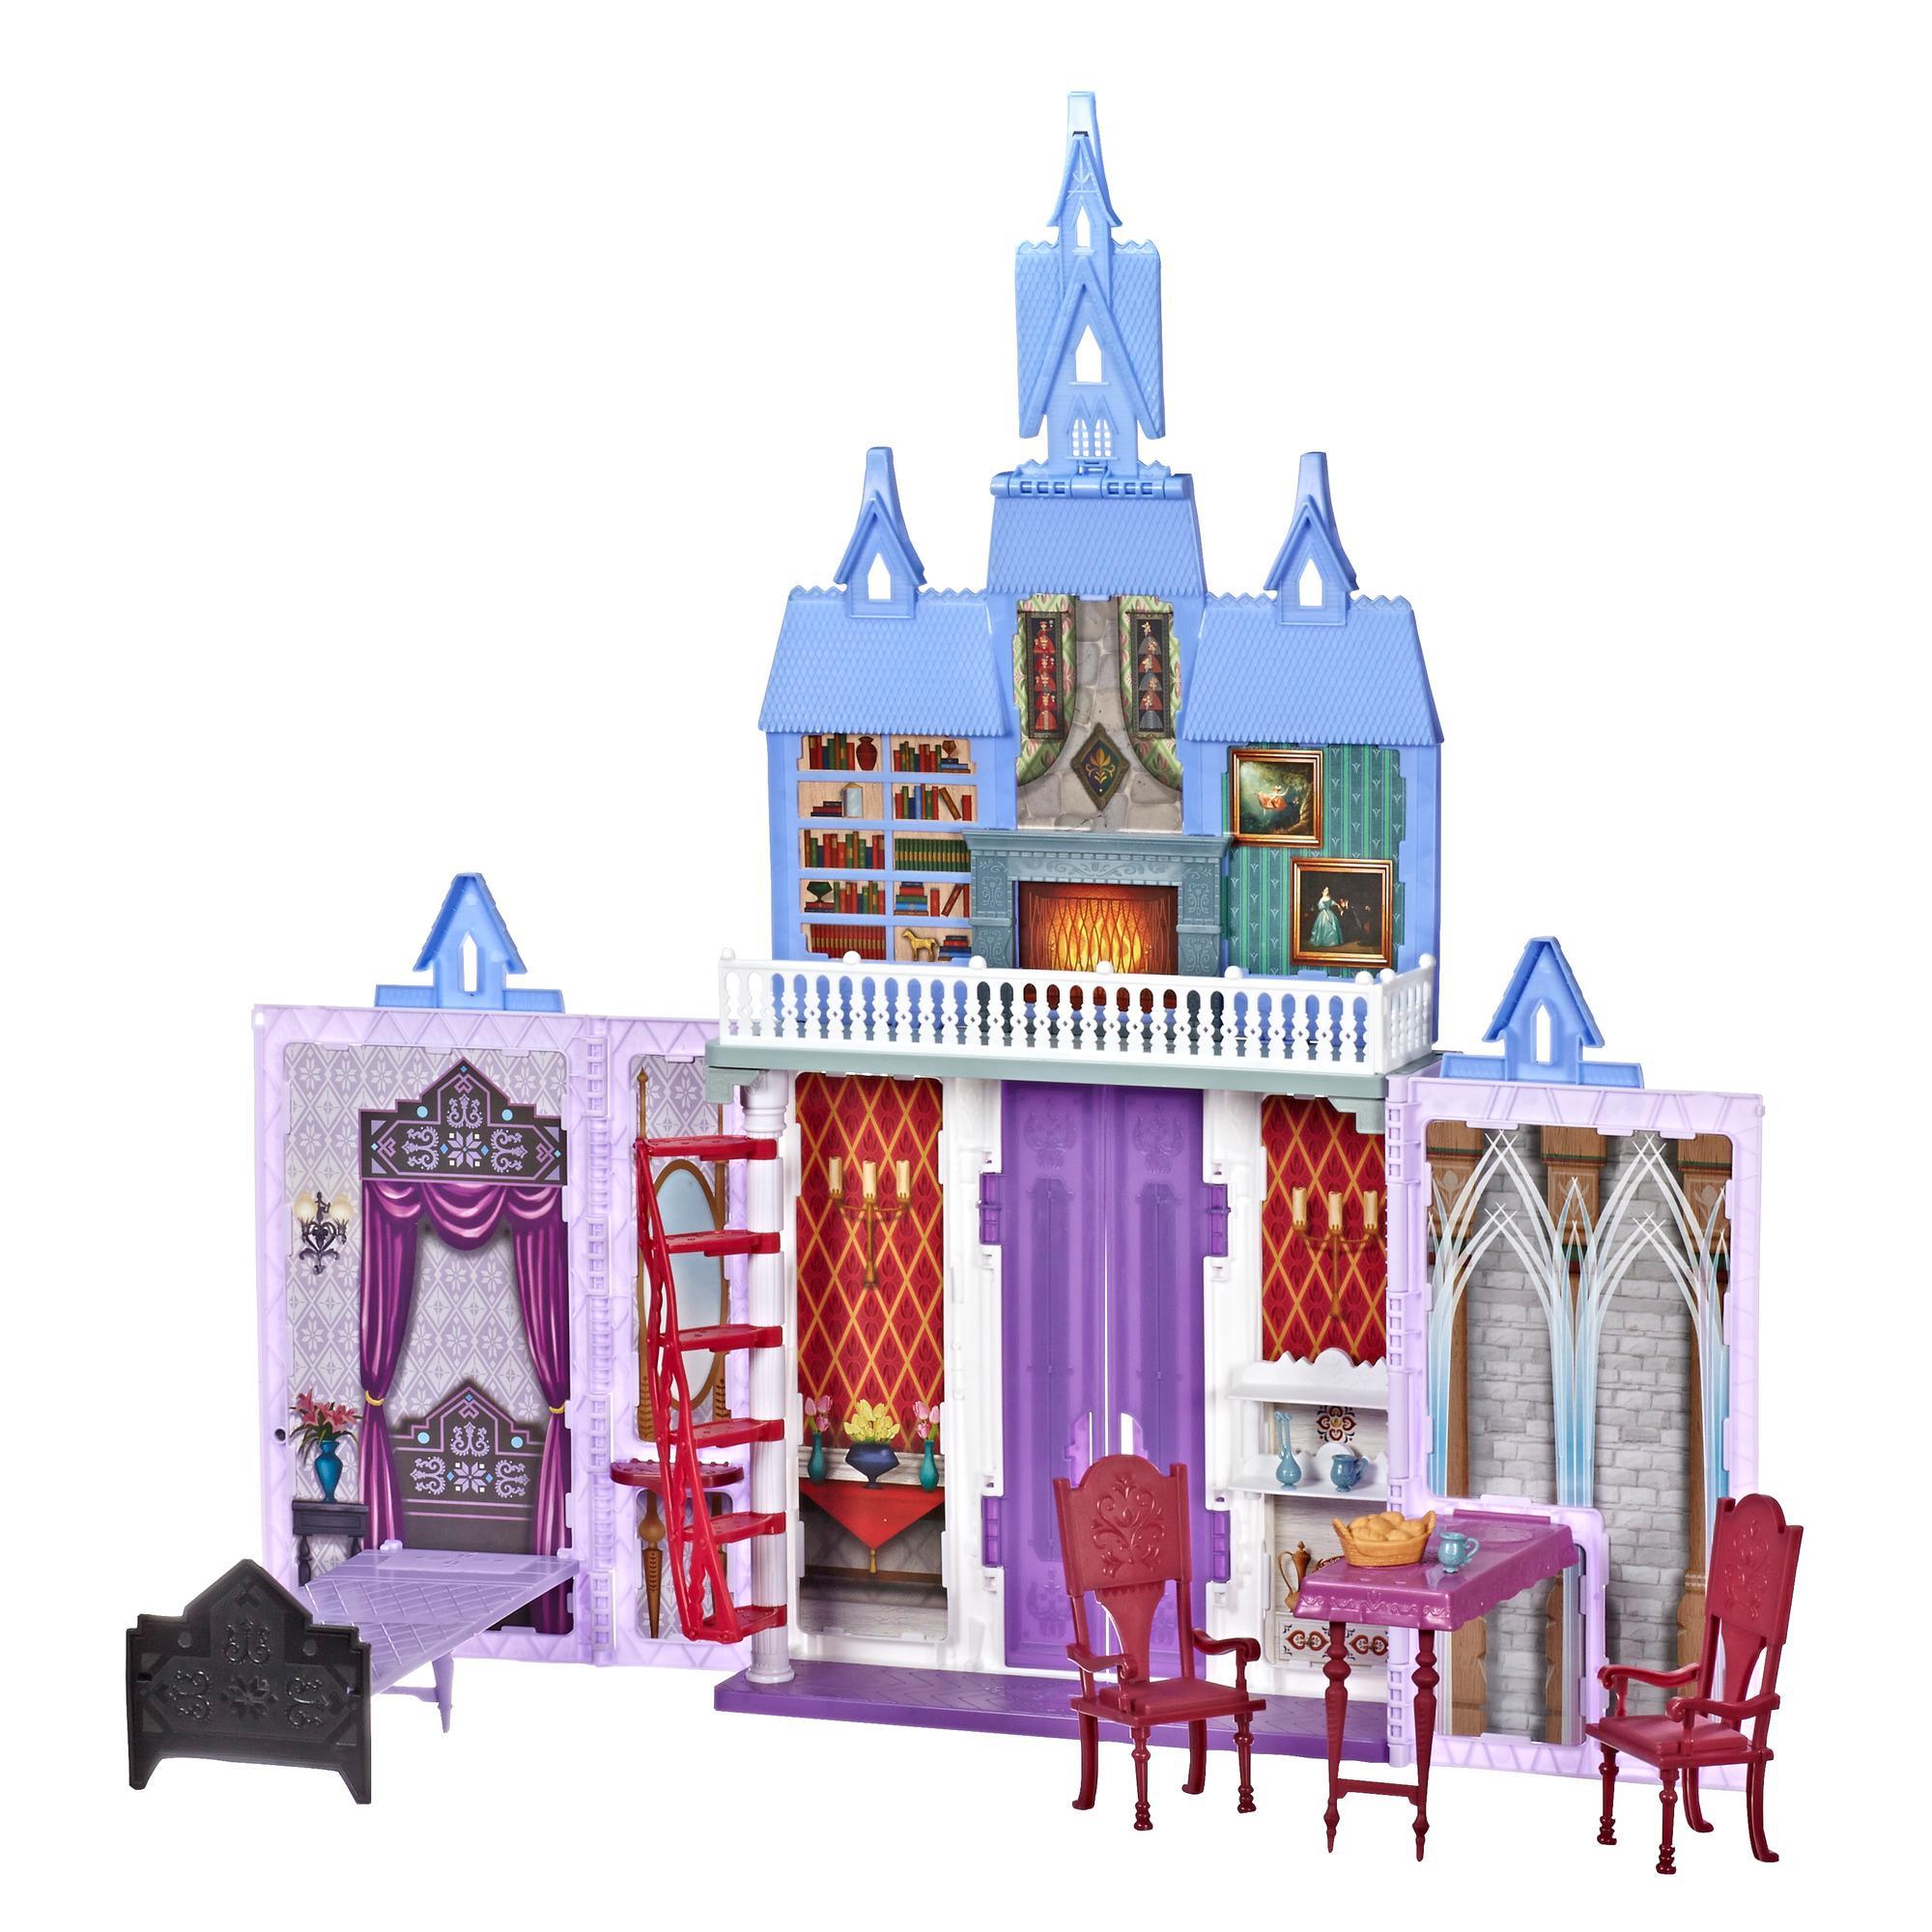 Disney Frozen - Castillo de Arendelle portátil - Juguete inspirado en Frozen 2 de Disney